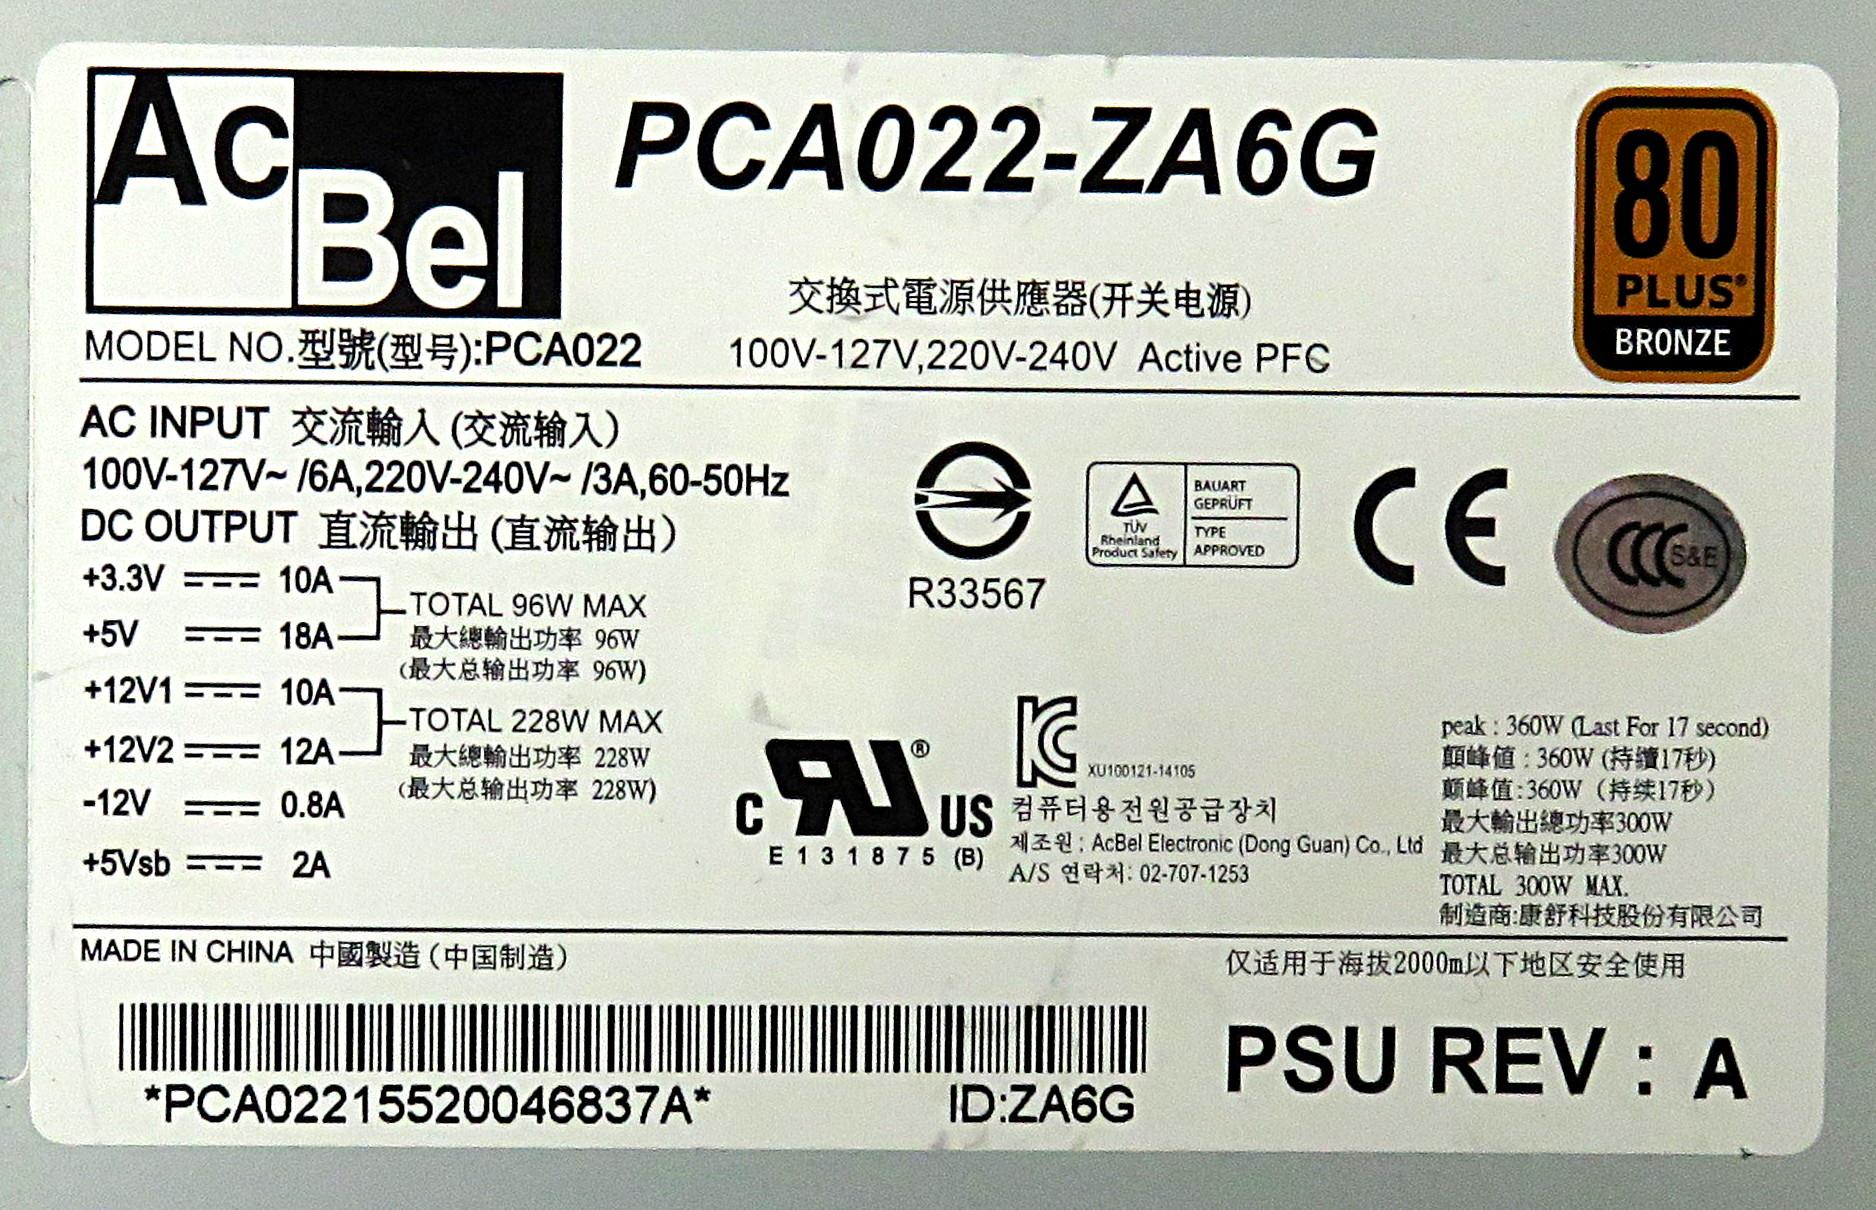 AcBel  PCA022 300W 24-Pin 80+ Bronze ATX PSU PCA022-ZA6G